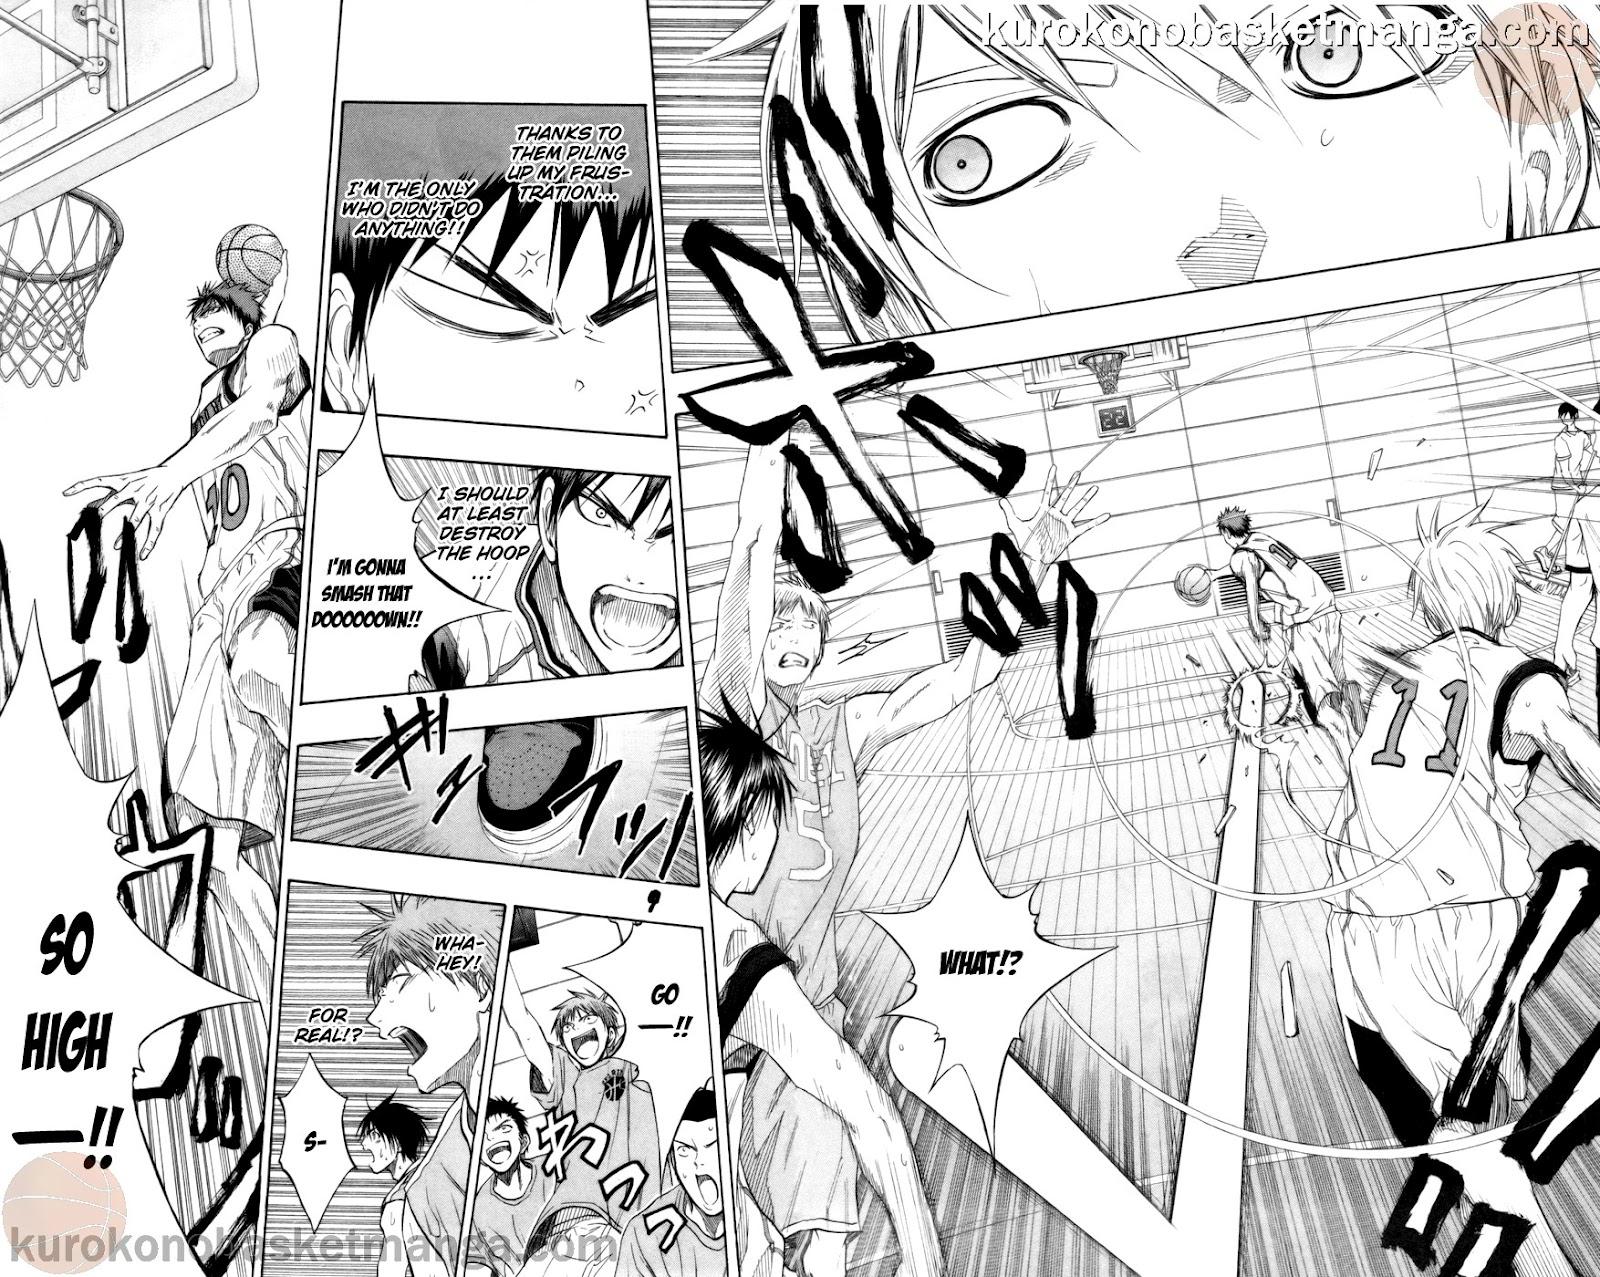 Kuroko no Basket Manga Chapter 82 - Image 16-17